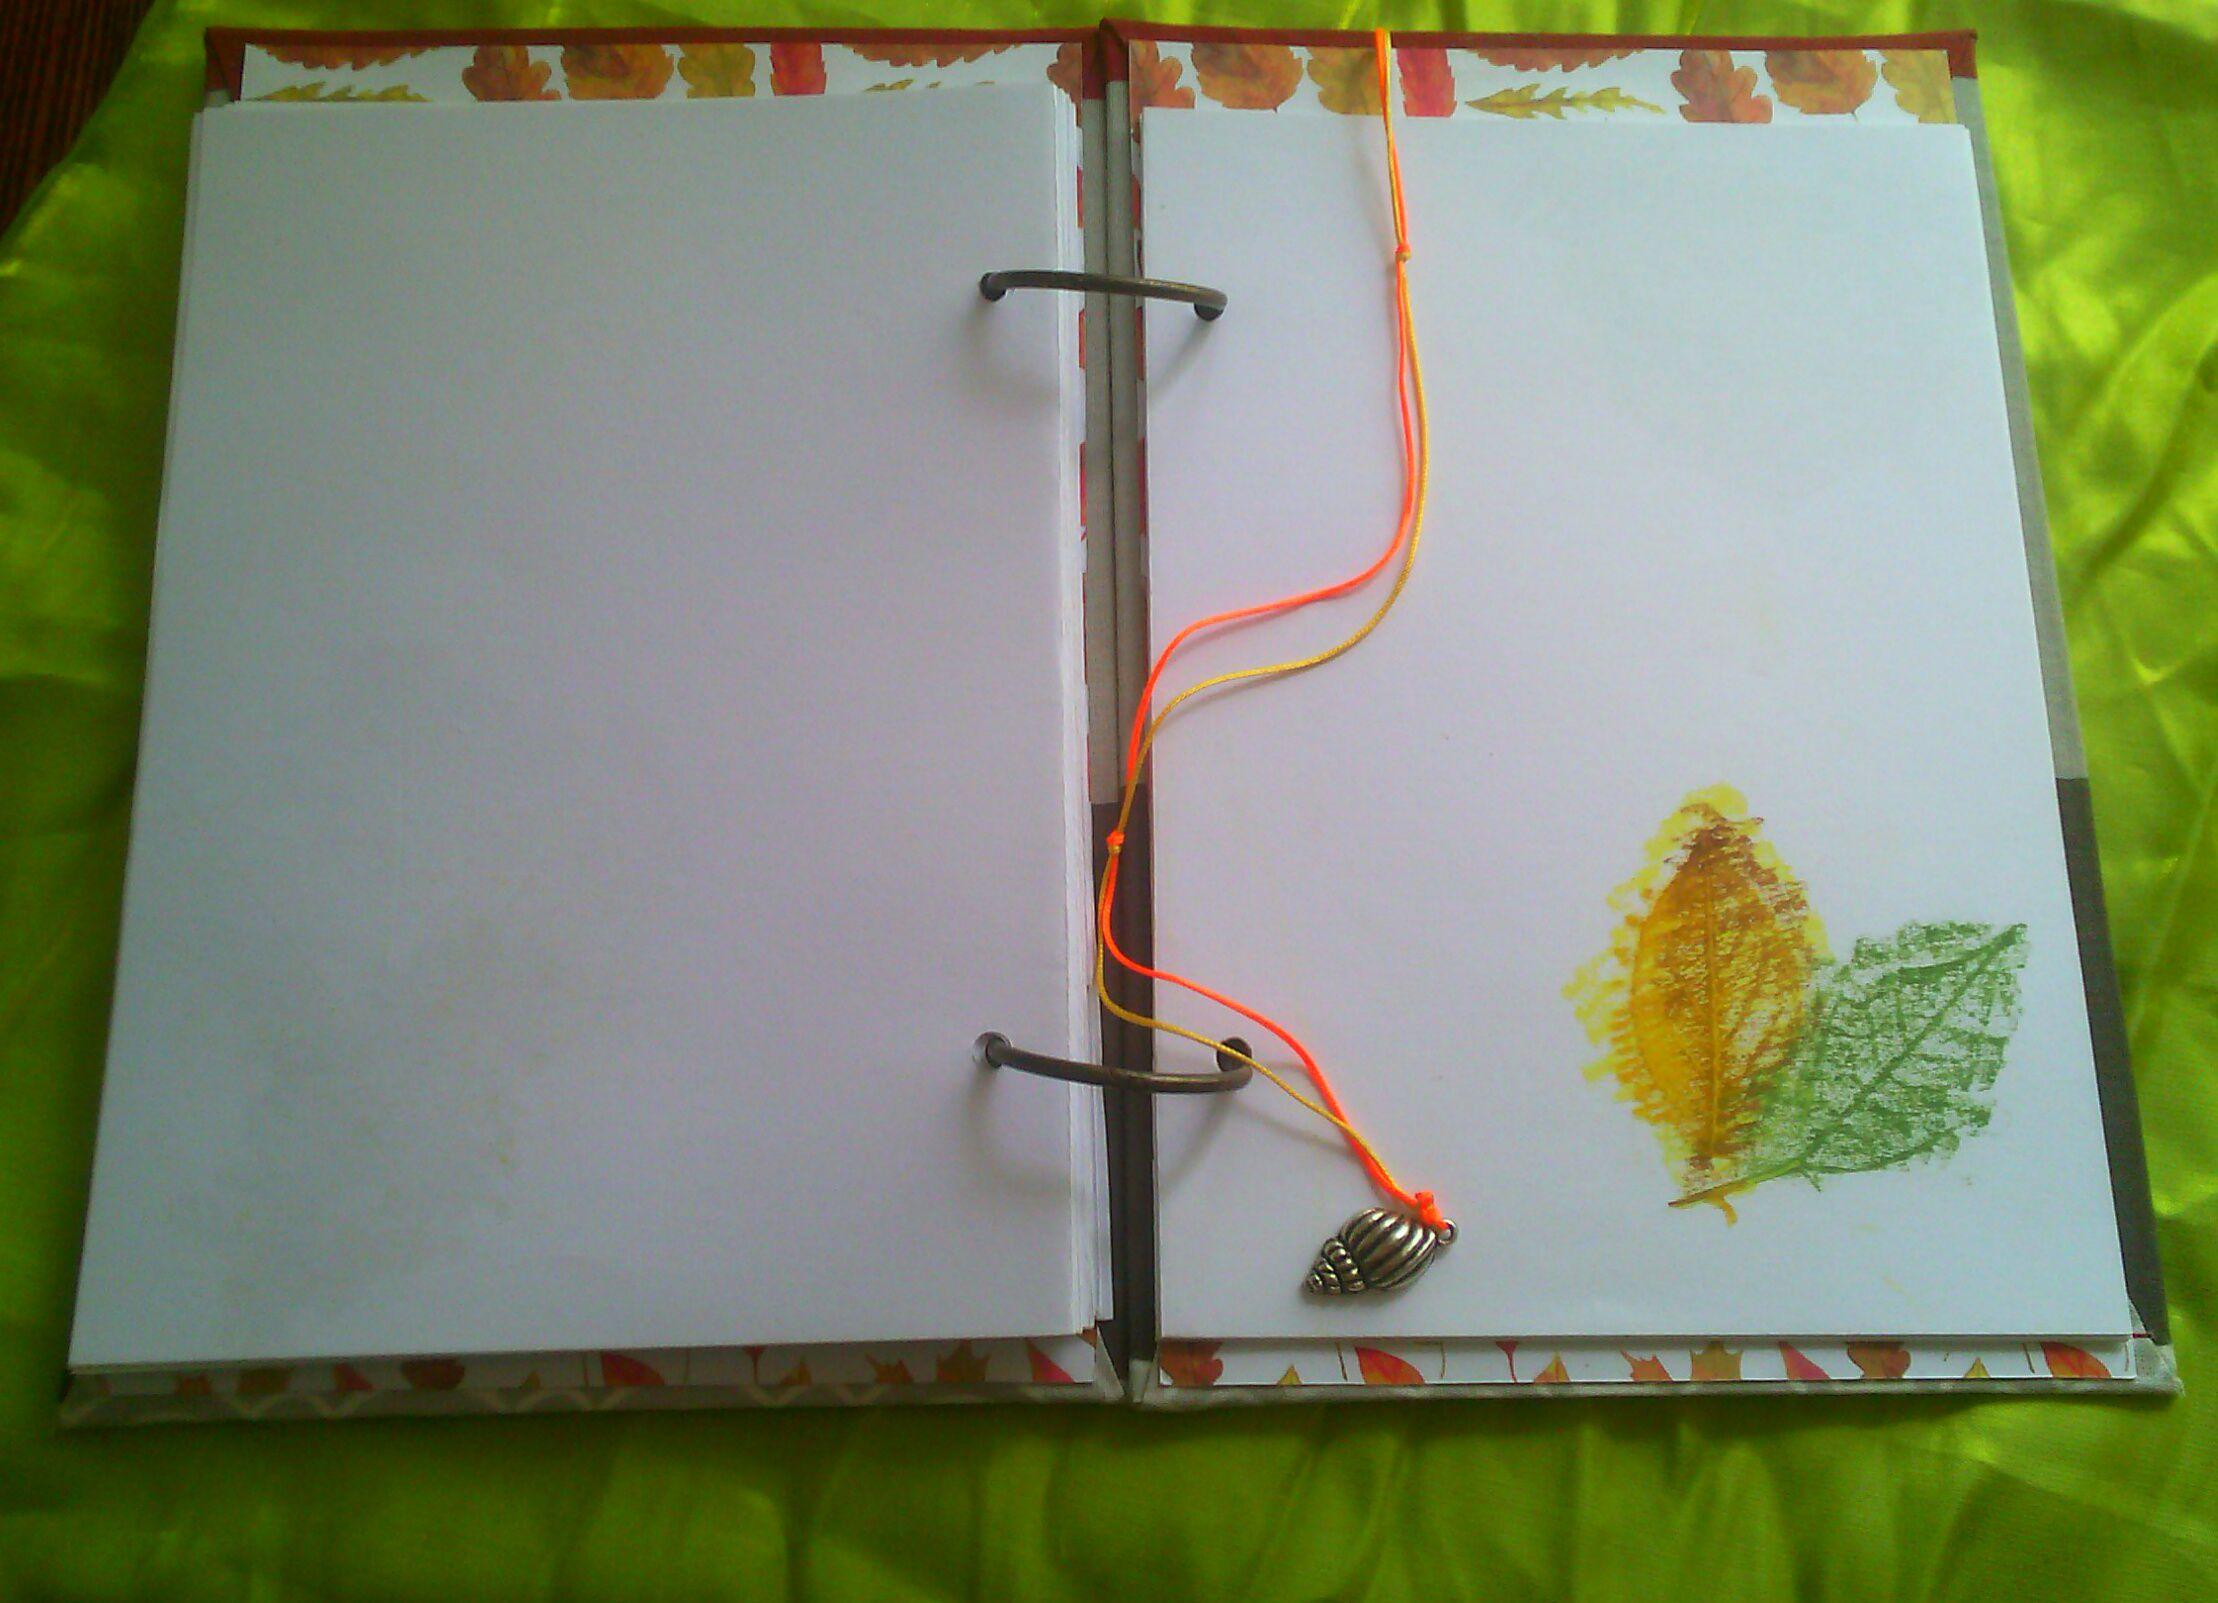 блокнот скрапбукинг записная книжка сувенир